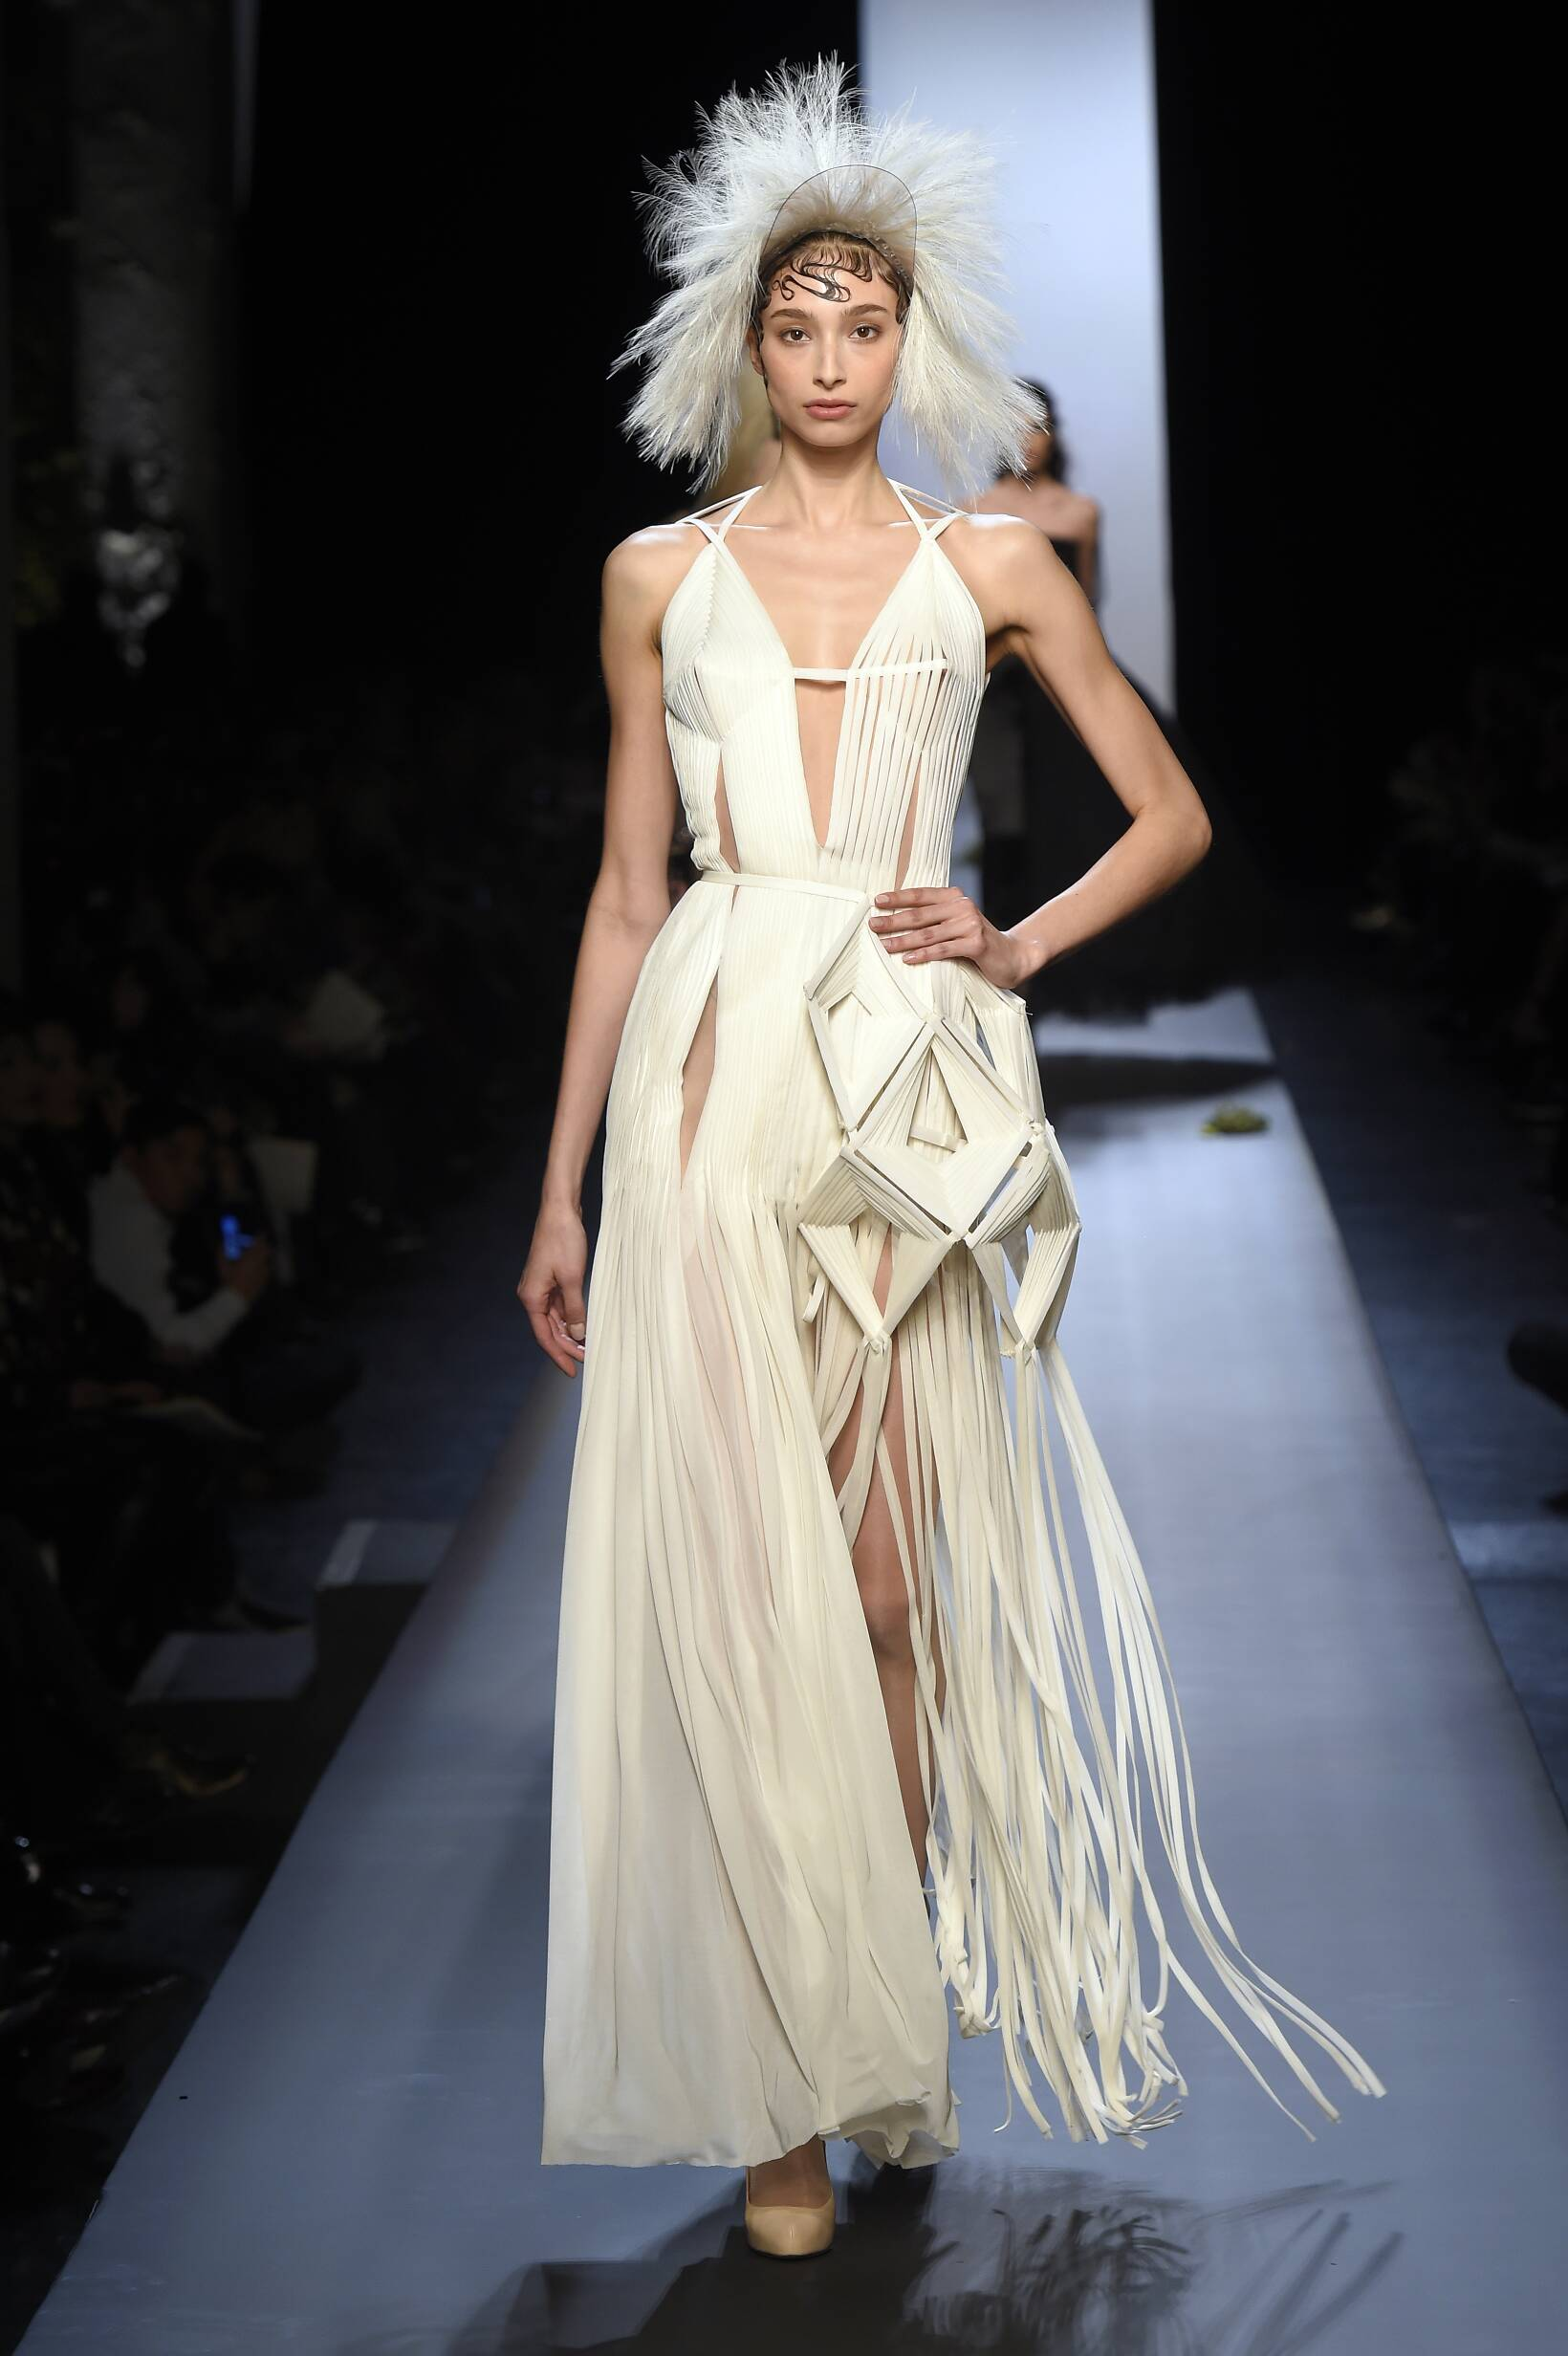 2015 Catwalk Jean Paul Gaultier Haute Couture Spring Summer Women's Collection Paris Fashion Week